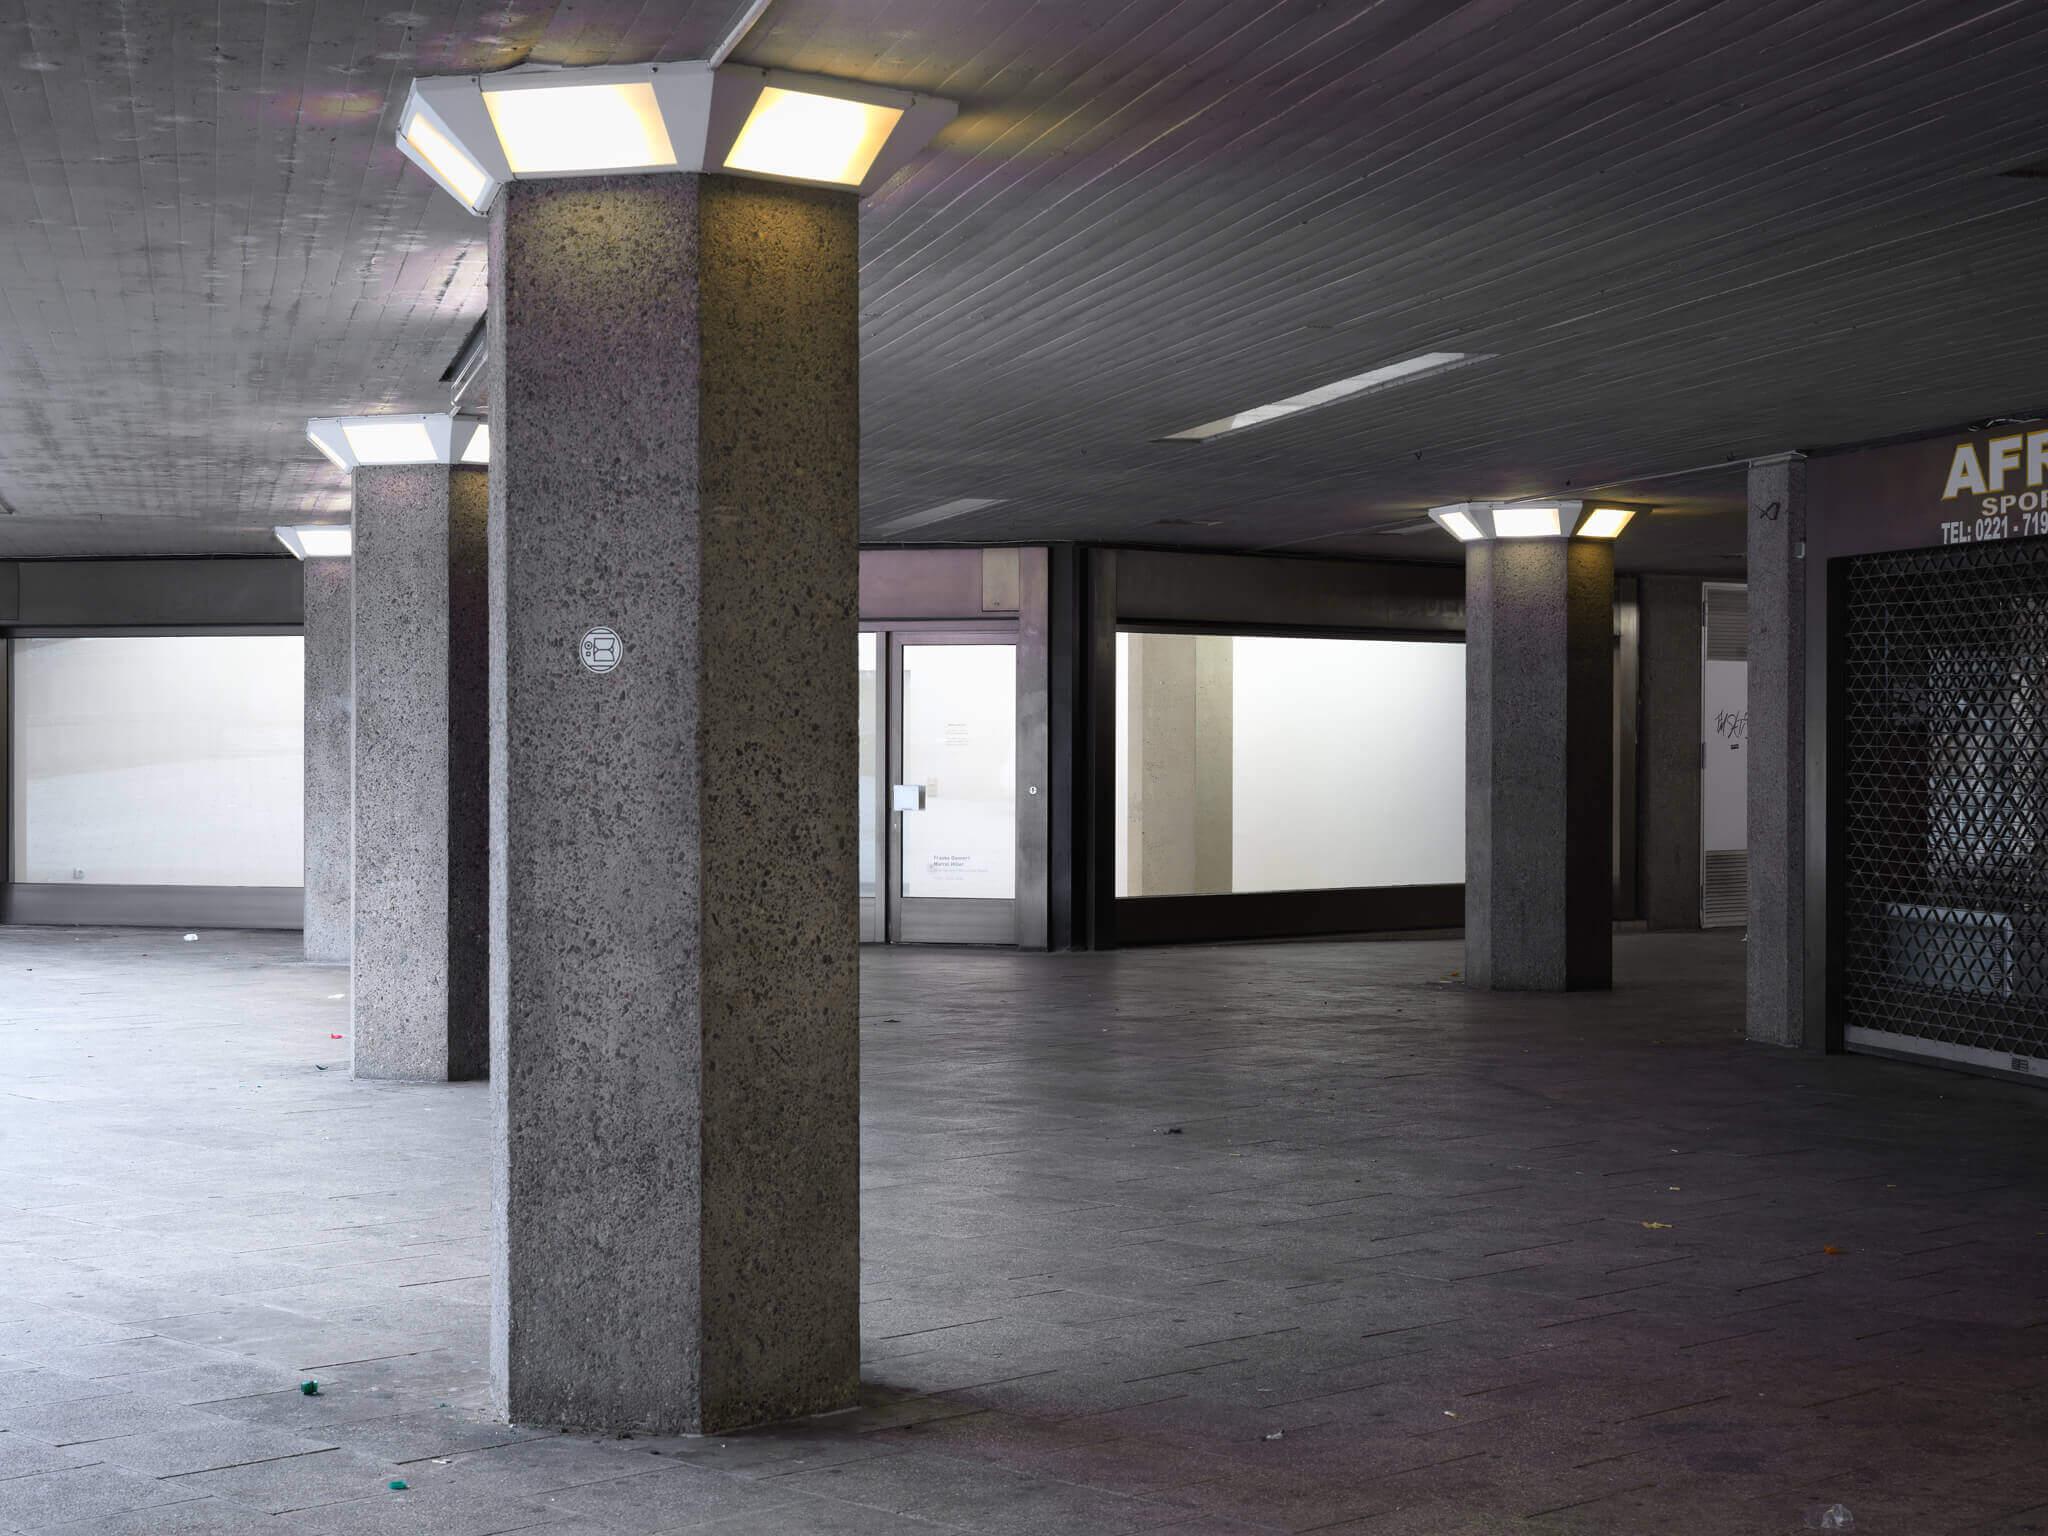 20140304_Frauke Dannert_Installation_0002 Kopie